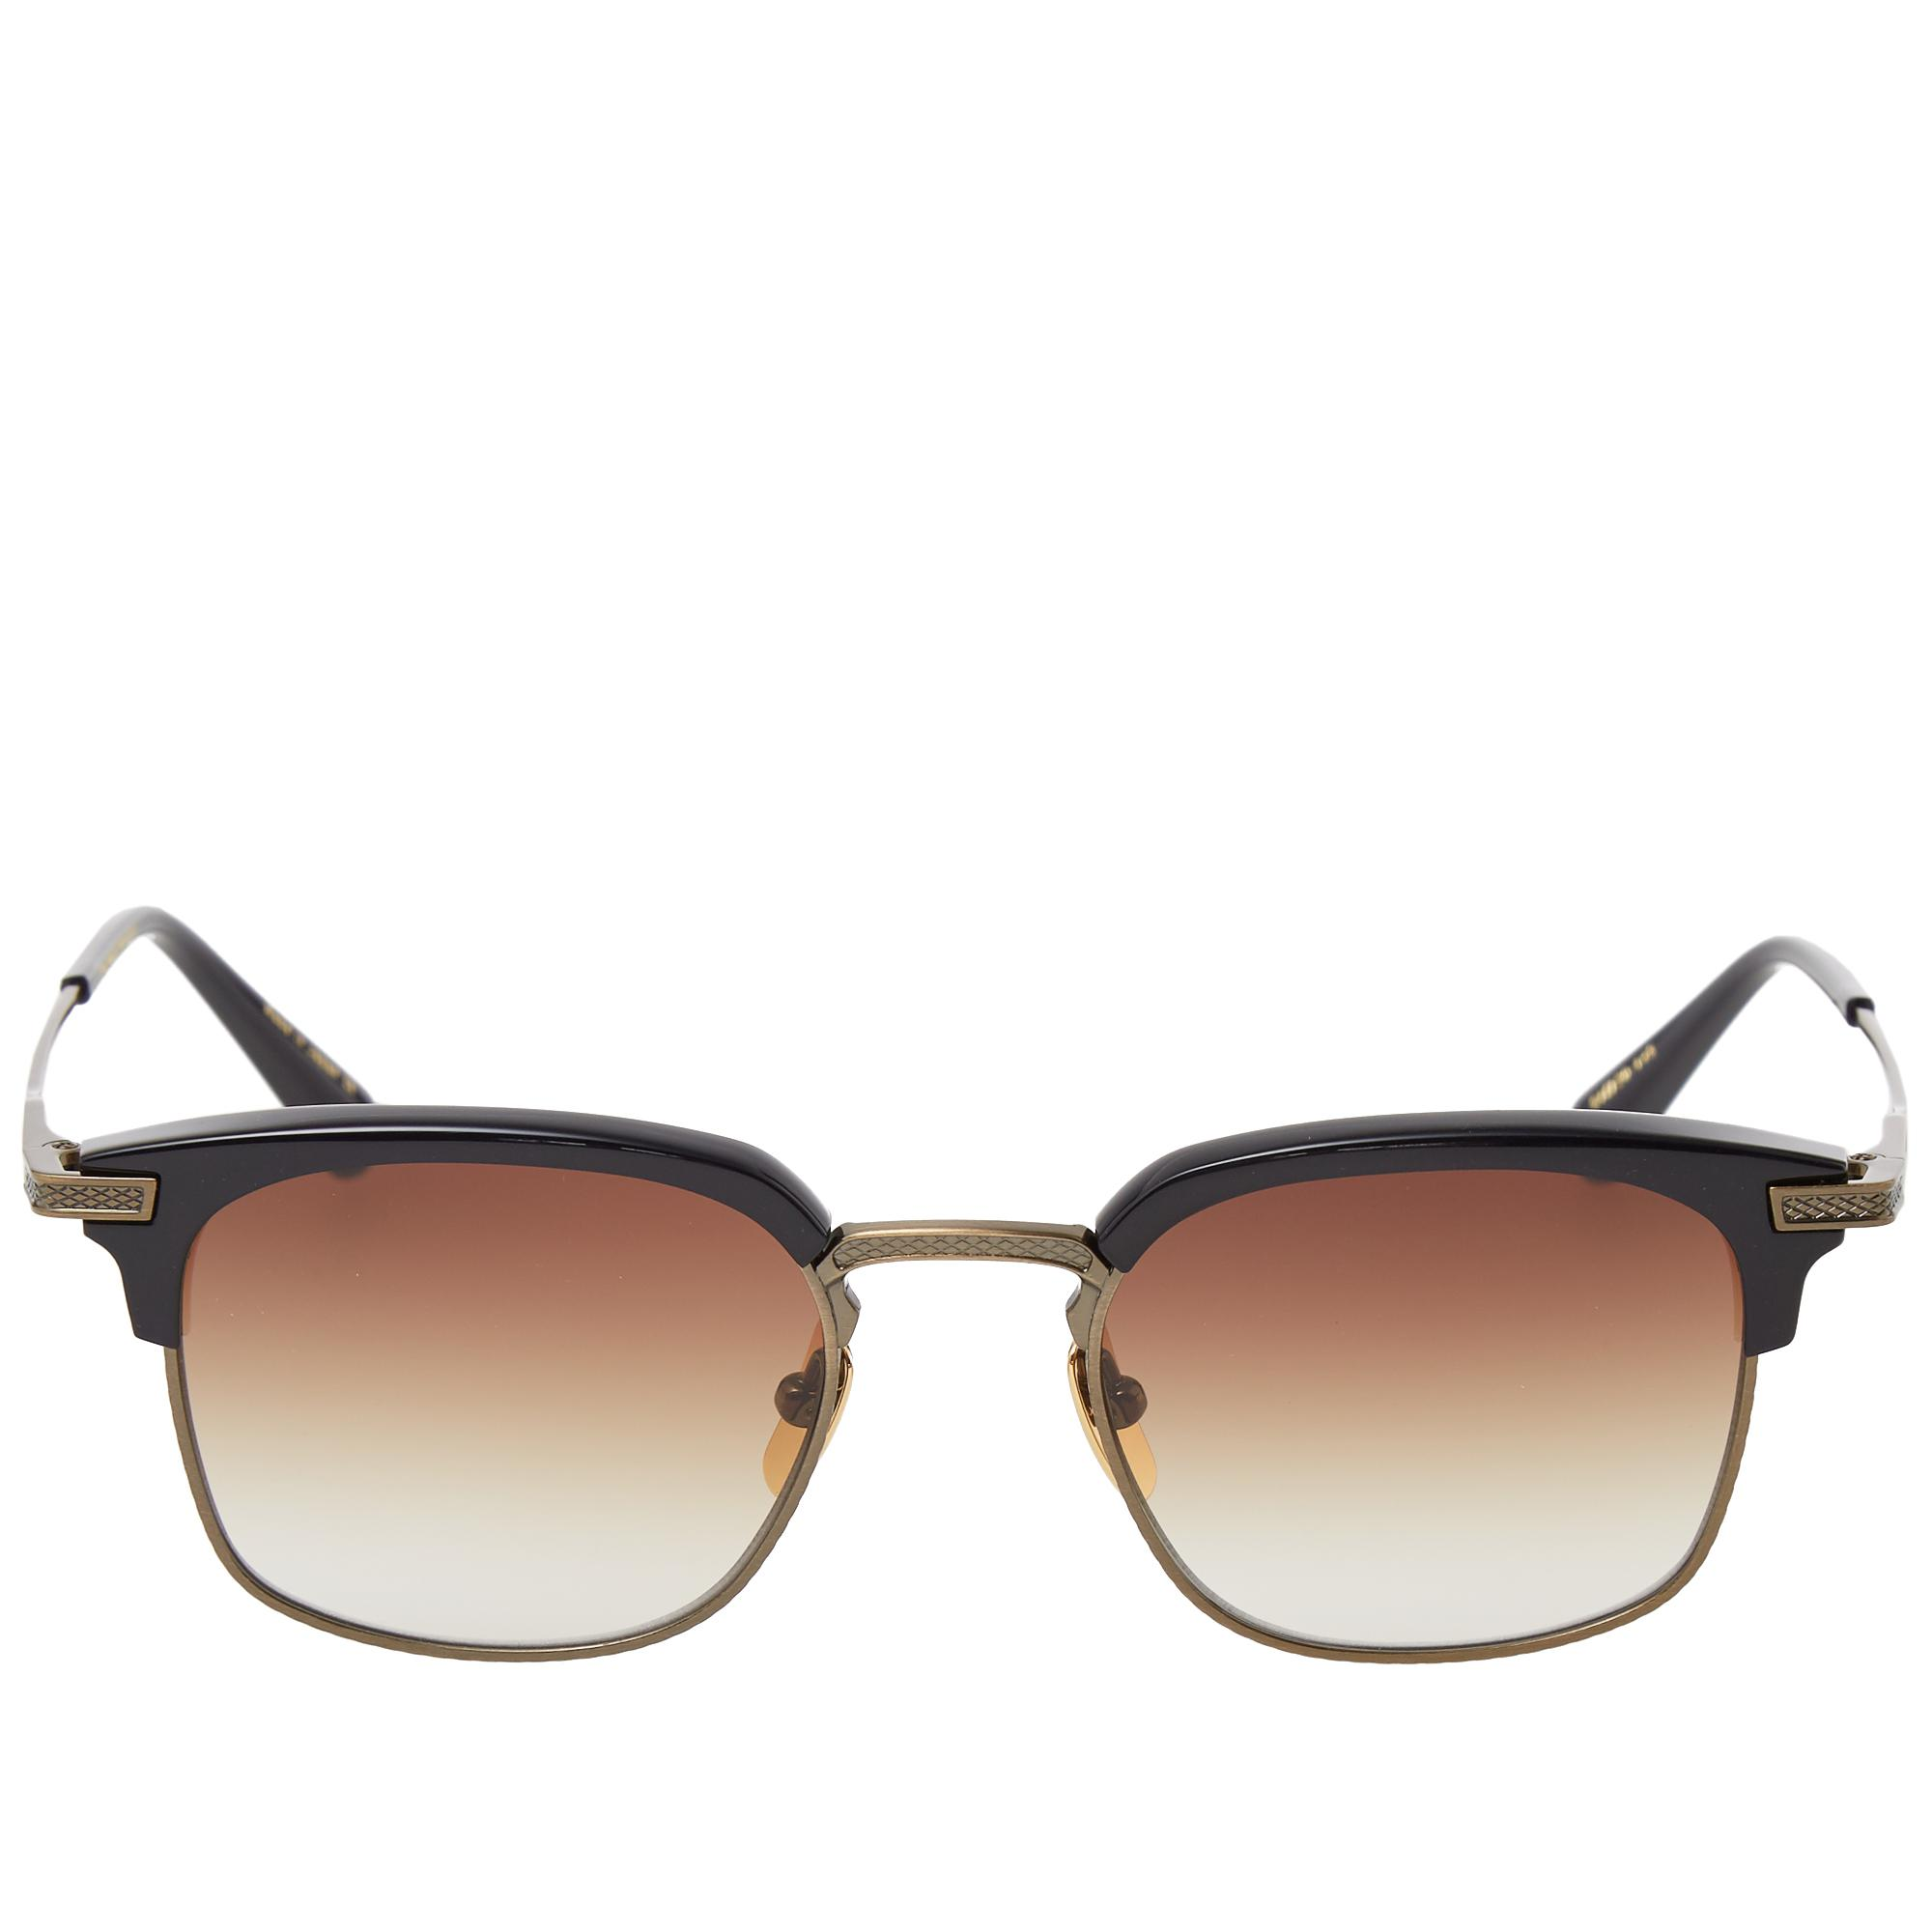 16bf4f775ddf Dita - Blue Nomad Sunglasses for Men - Lyst. View fullscreen